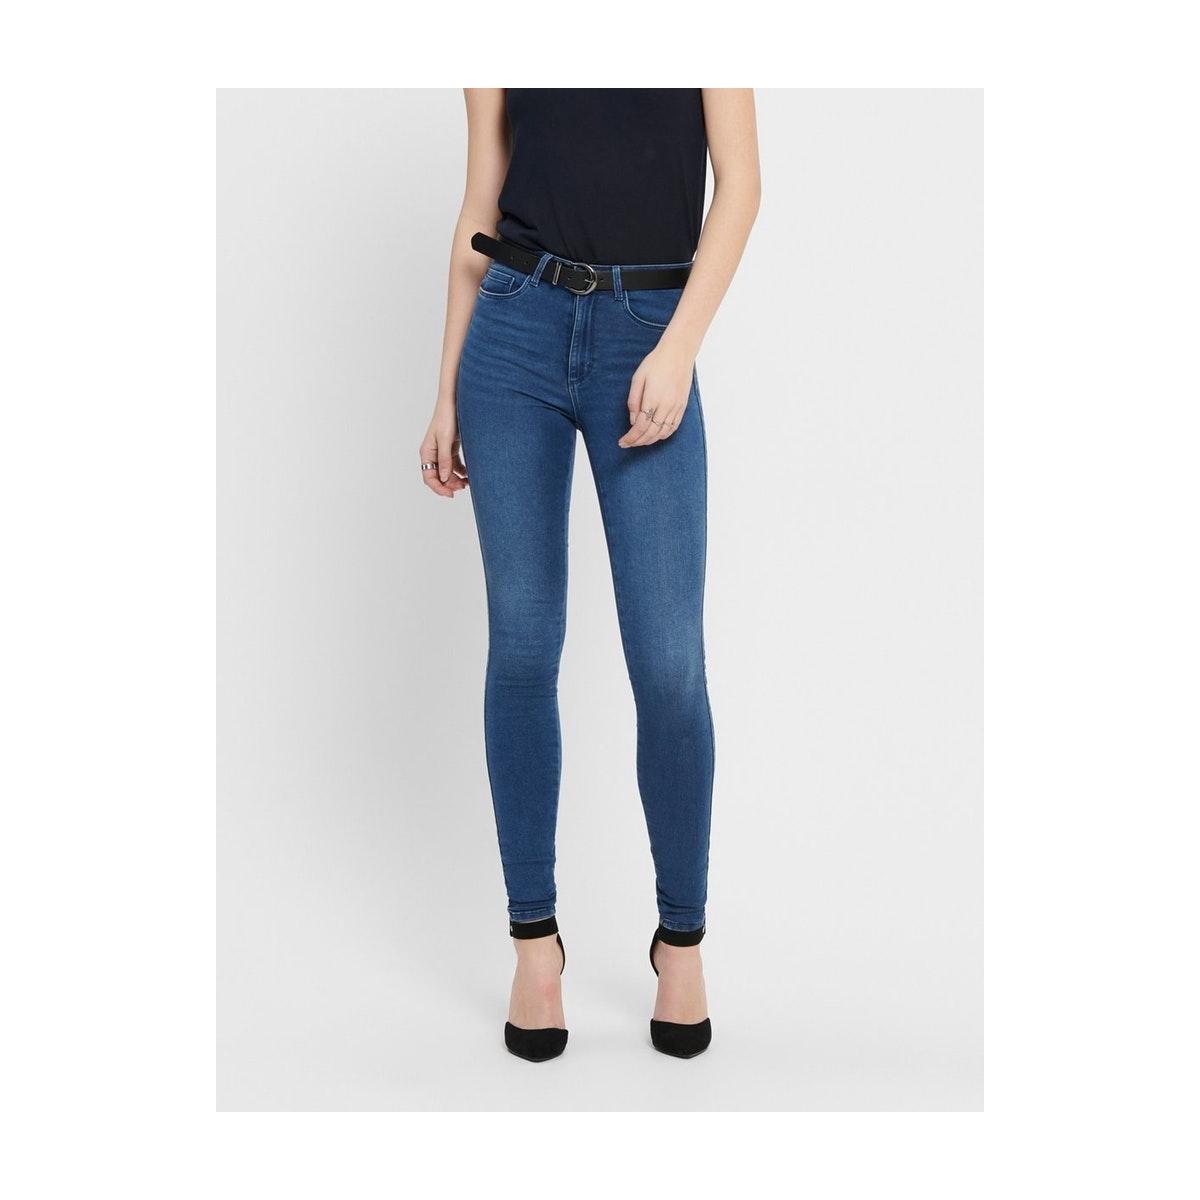 dba7b112d9 onlroyal high w.skinny jeans pim504 15097919 only jeans medium blue denim